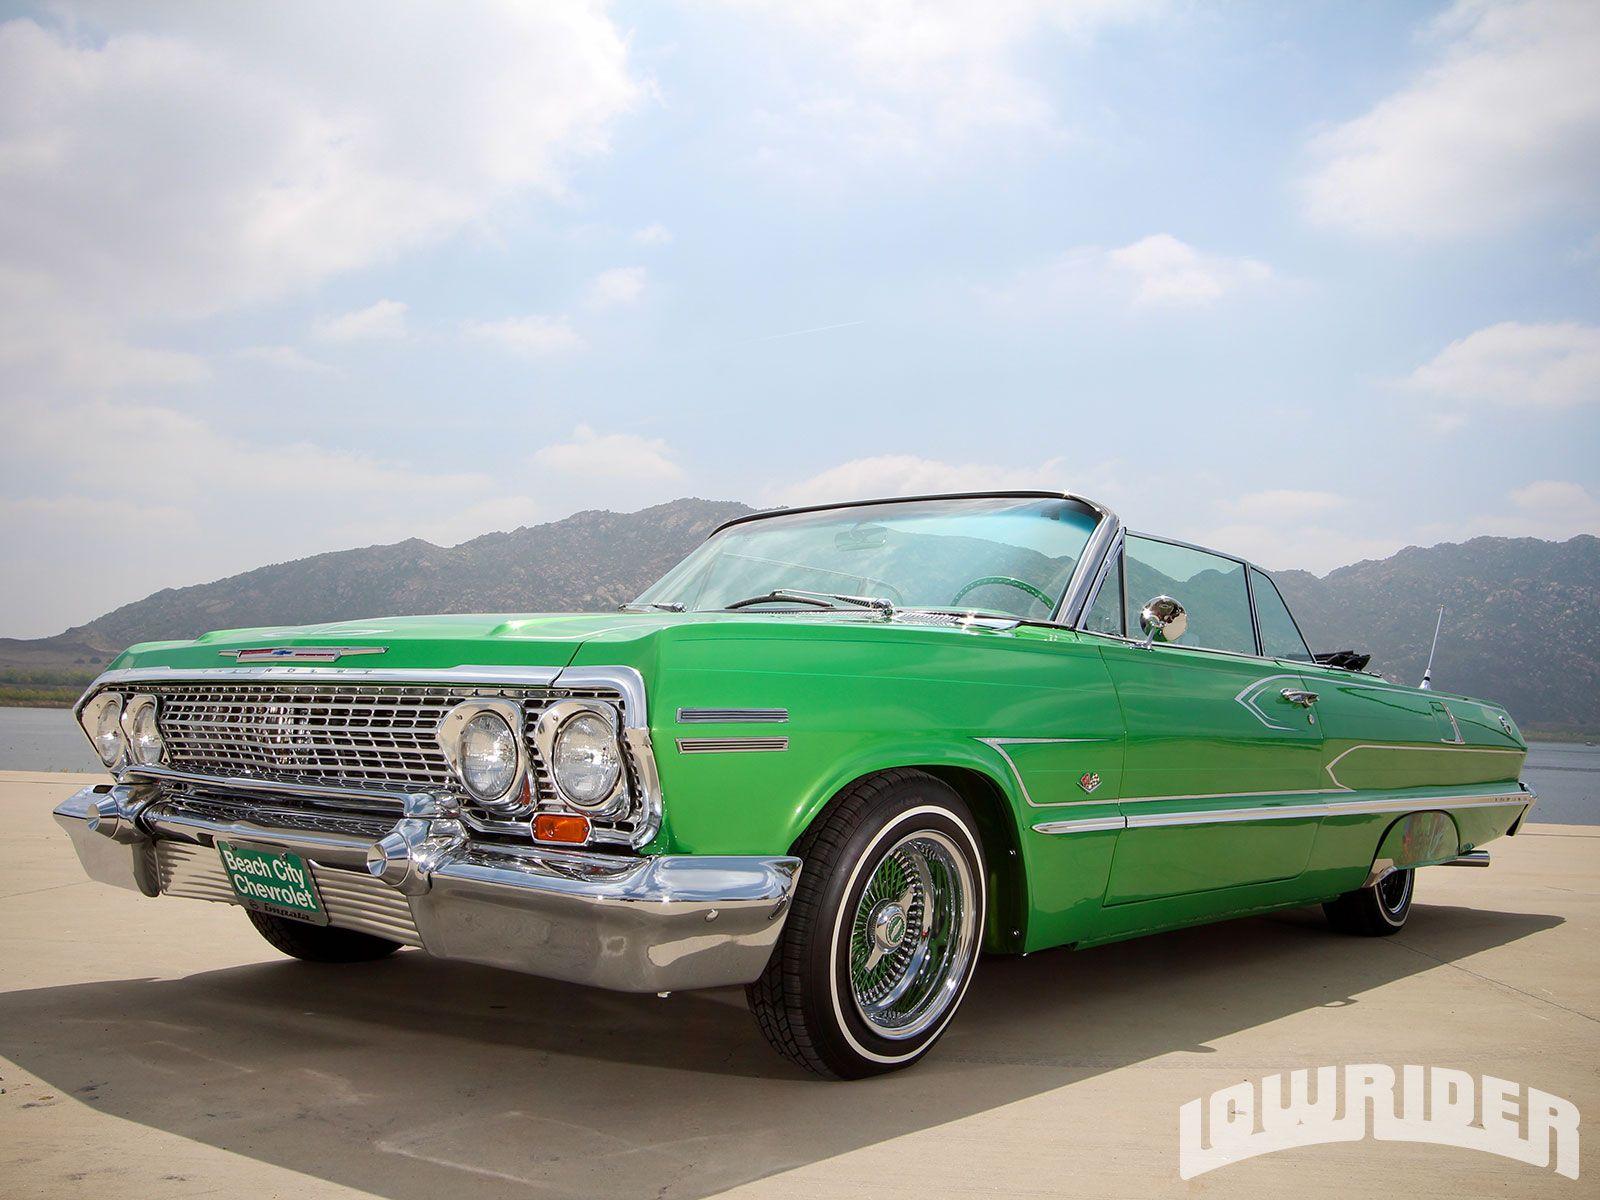 1963 Chevrolet Impala Convertible - Lowrider Magazine